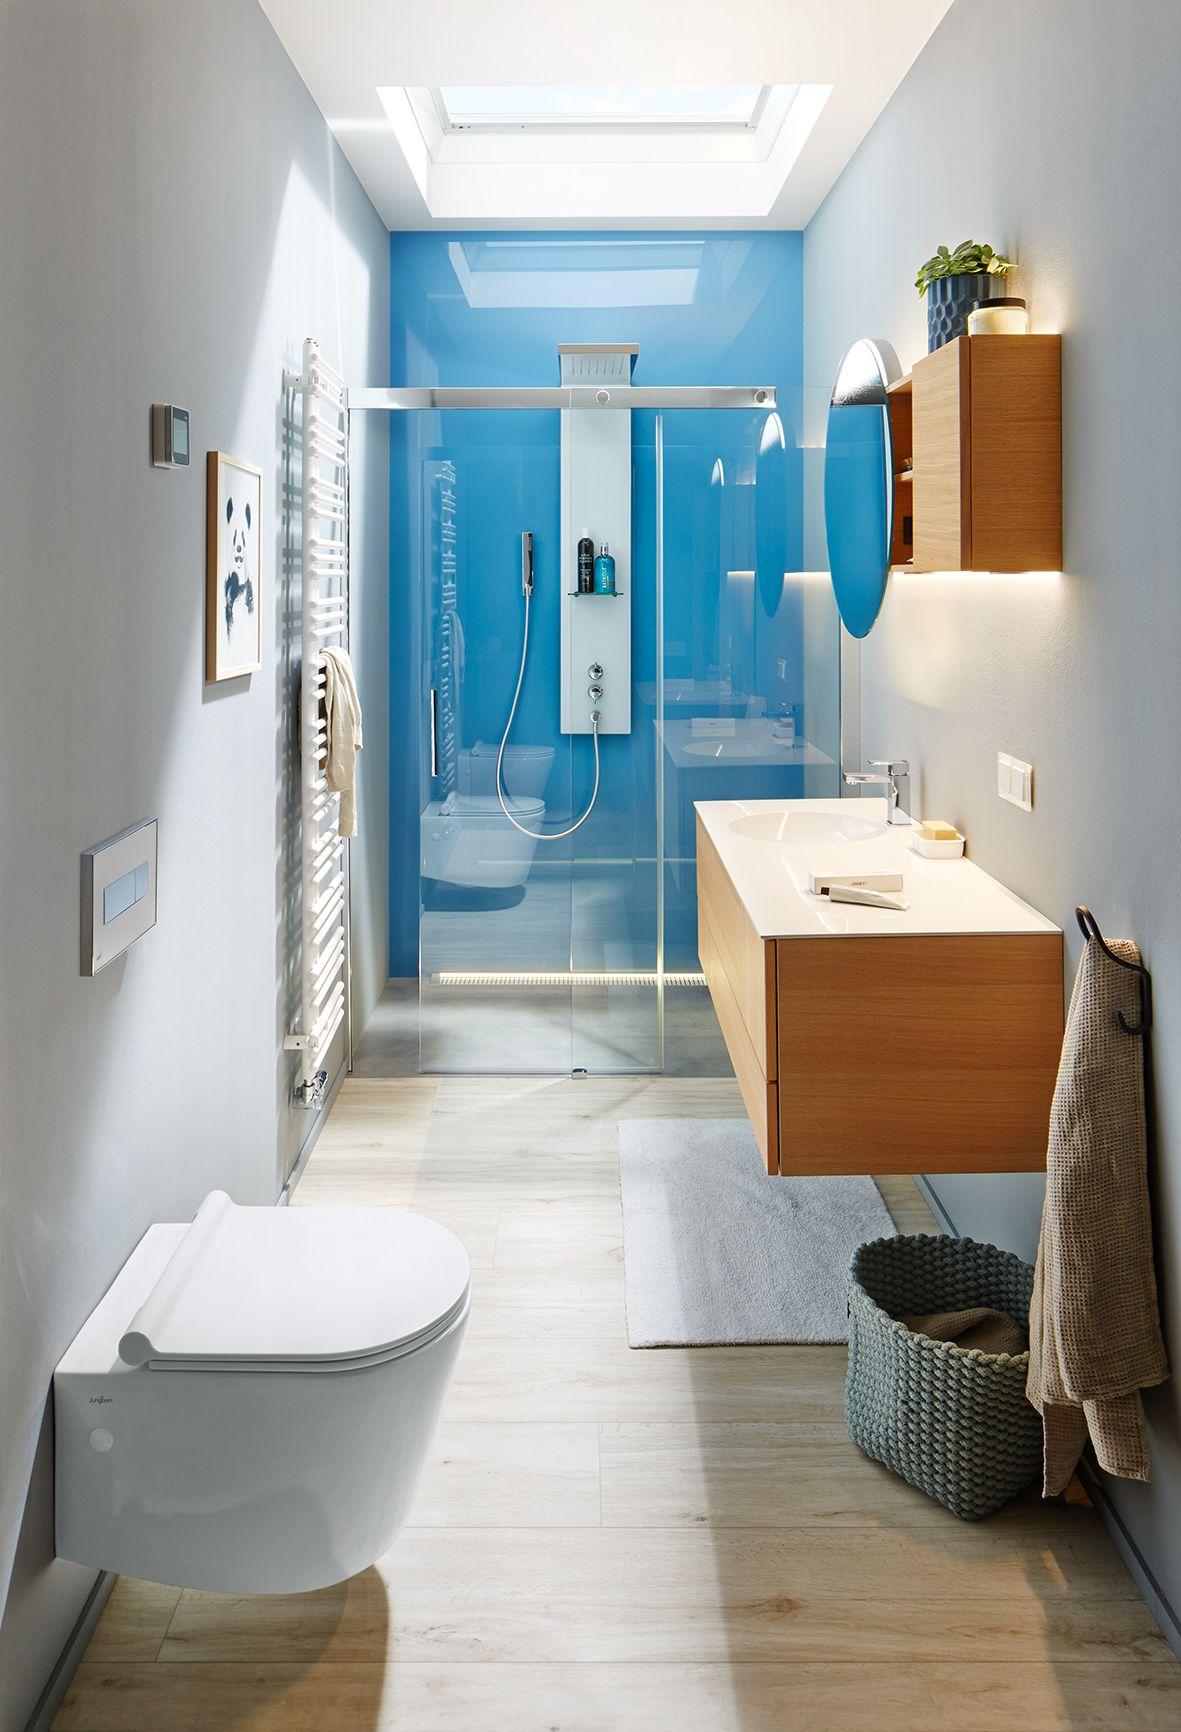 4 qm Duschbad | Bathroom Ideas | Pinterest | Duschbad, Badezimmer ...